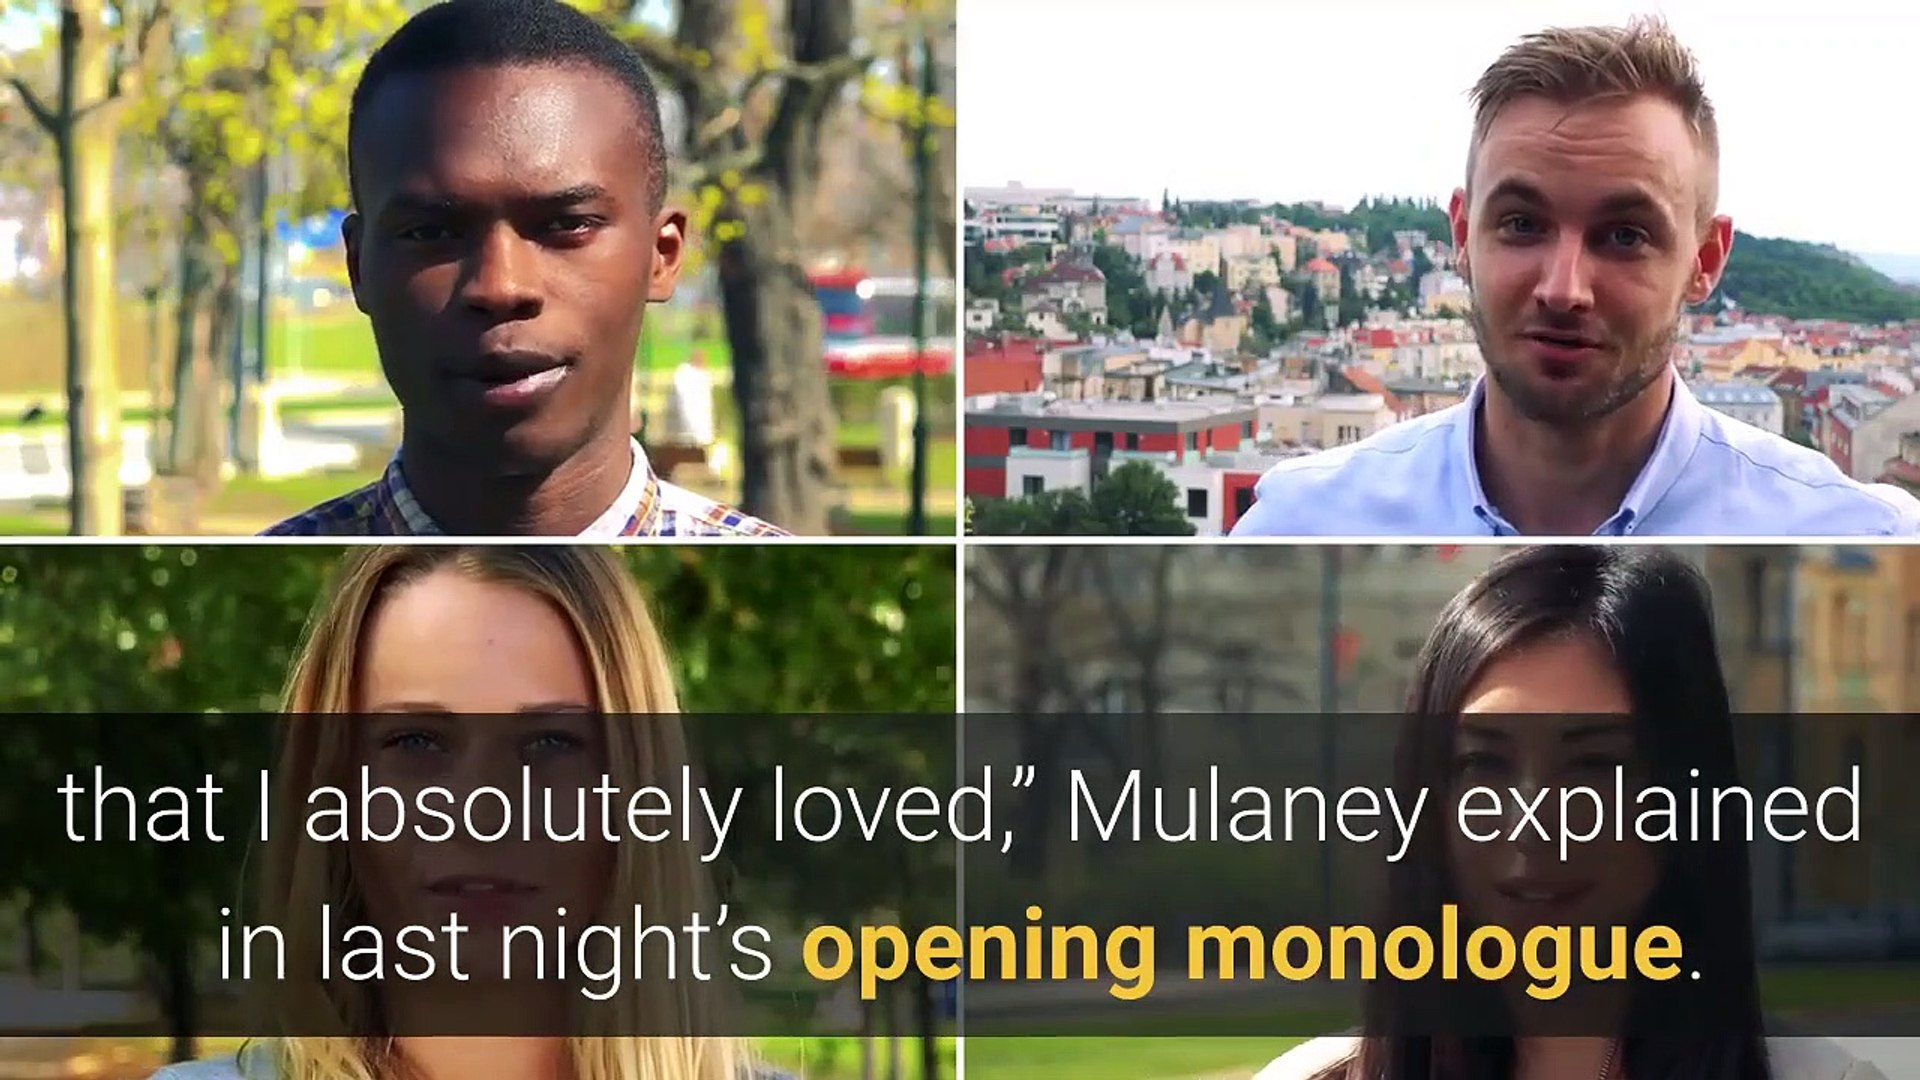 John Mulaney's Favorite Quarantine TV Show Was Andrew Cuomo's Press